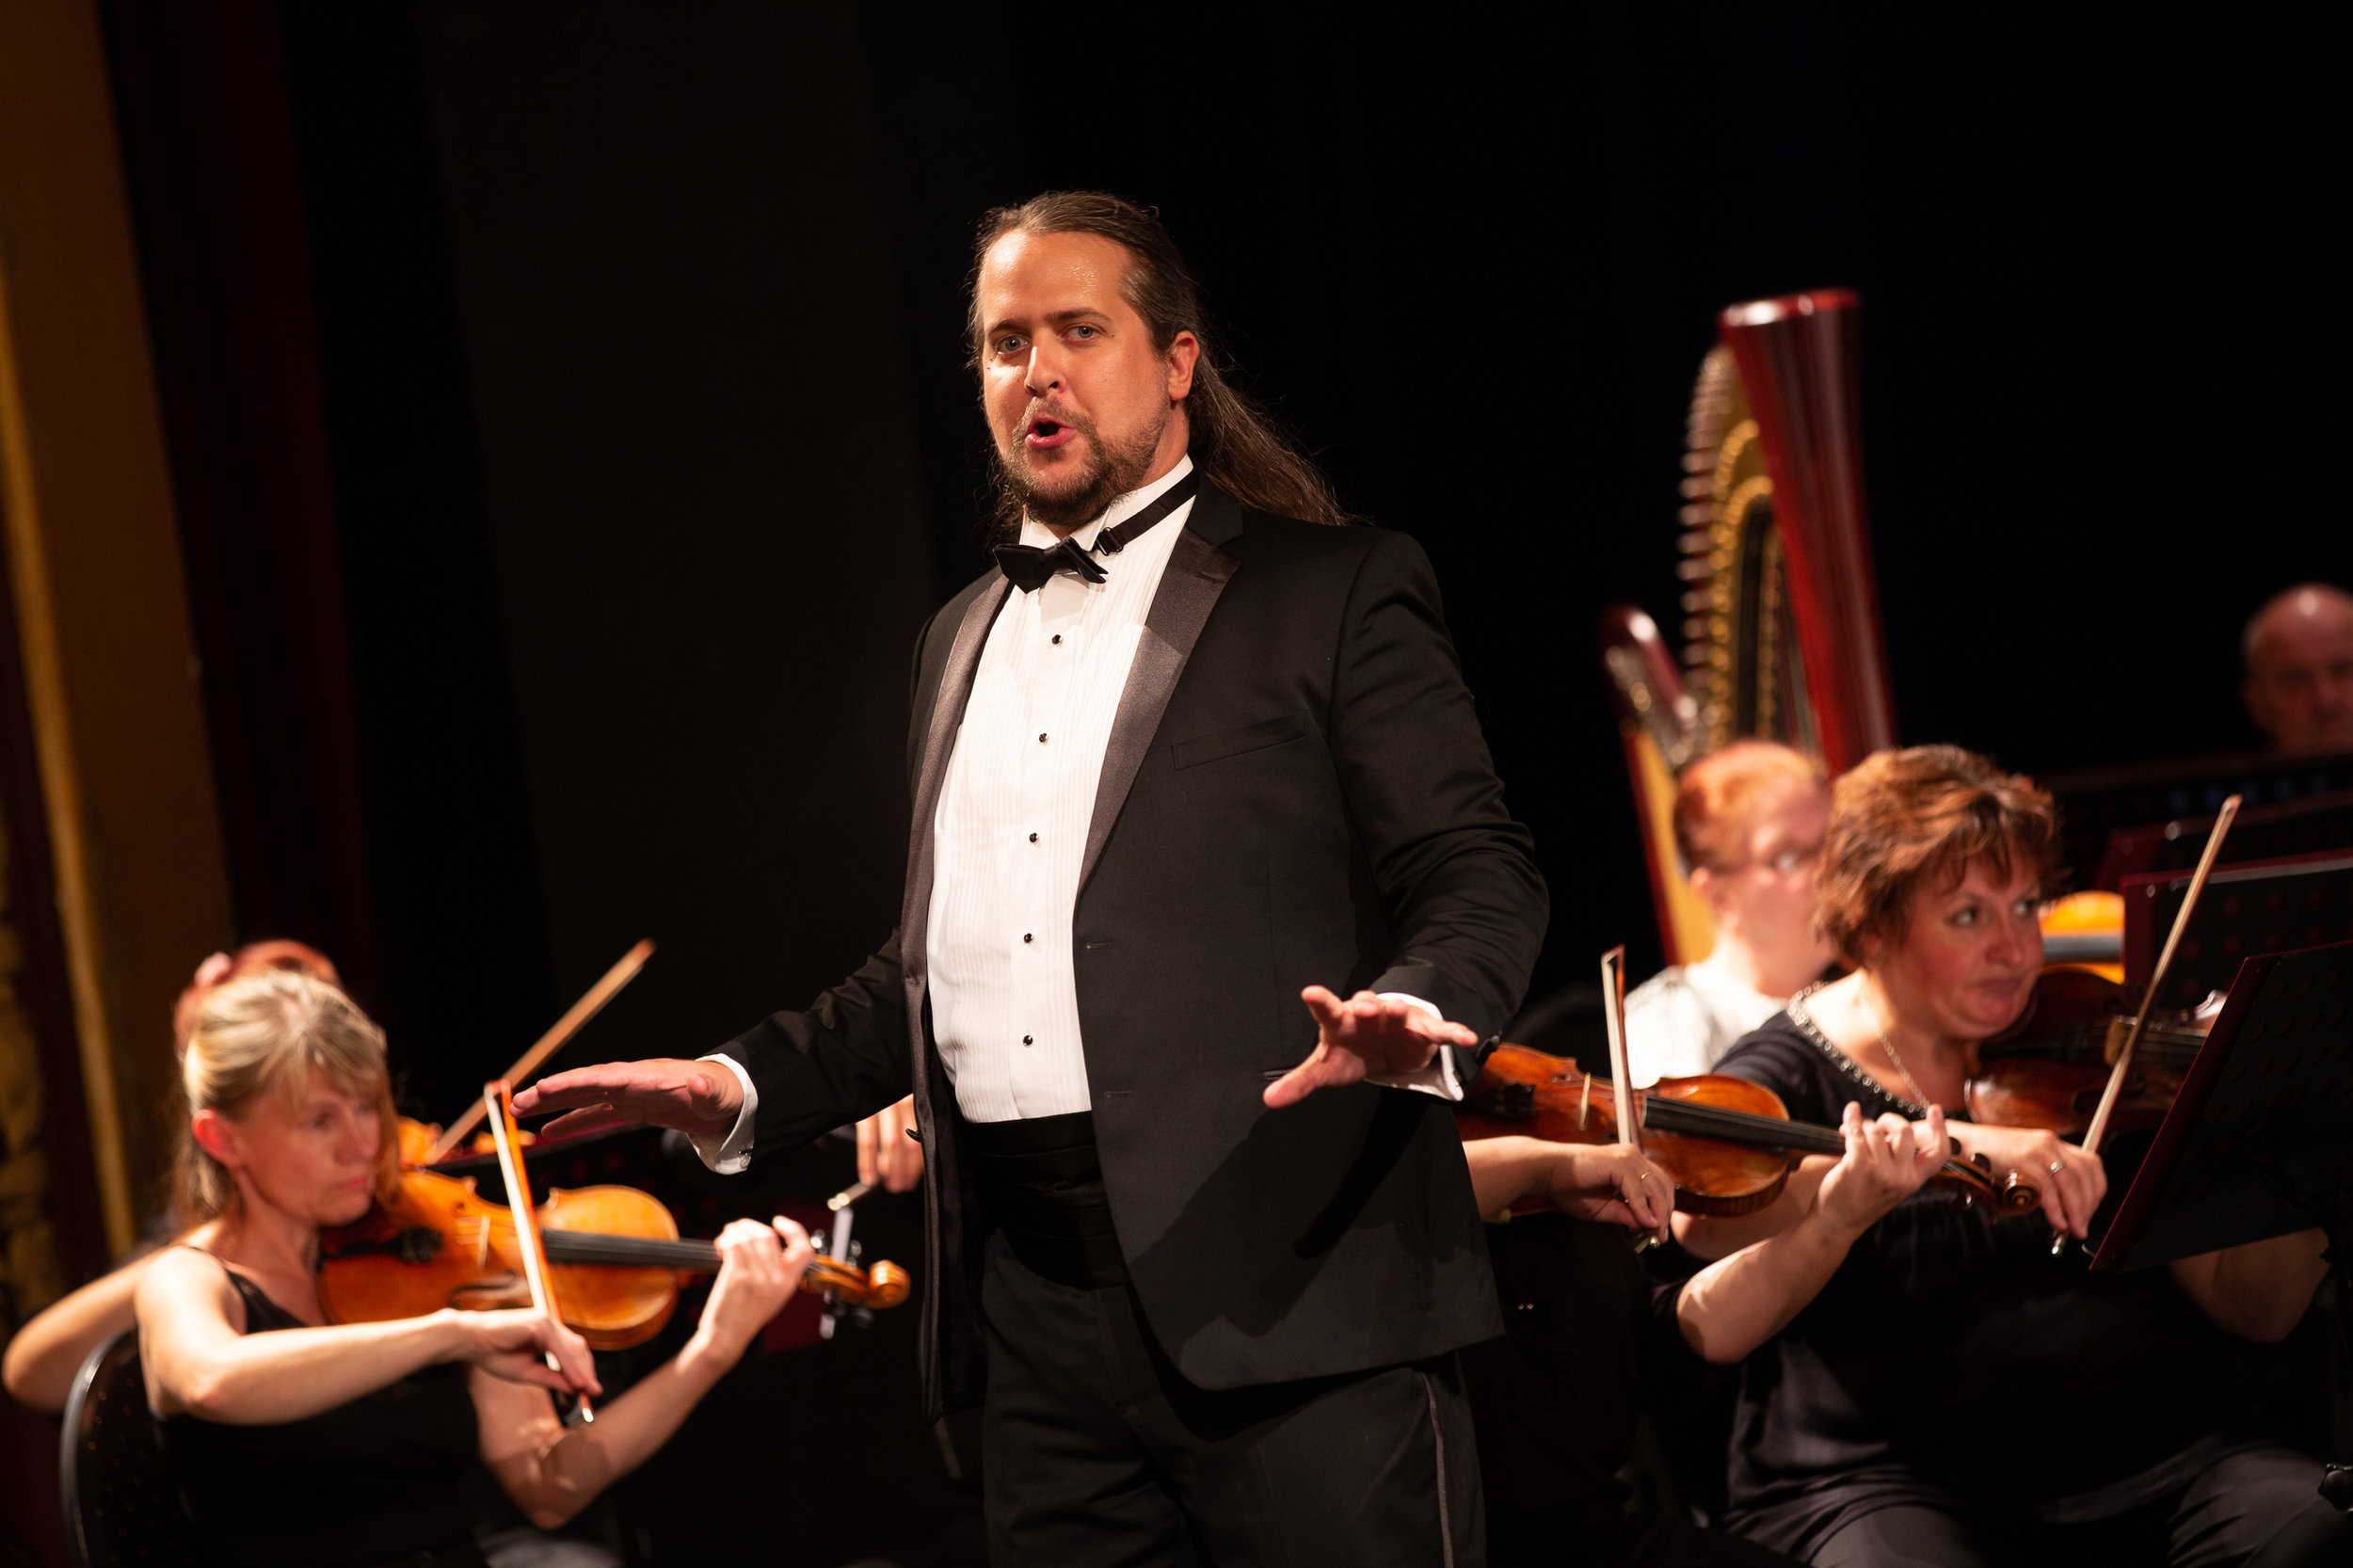 Andrew Hiers, Opernfest Prague